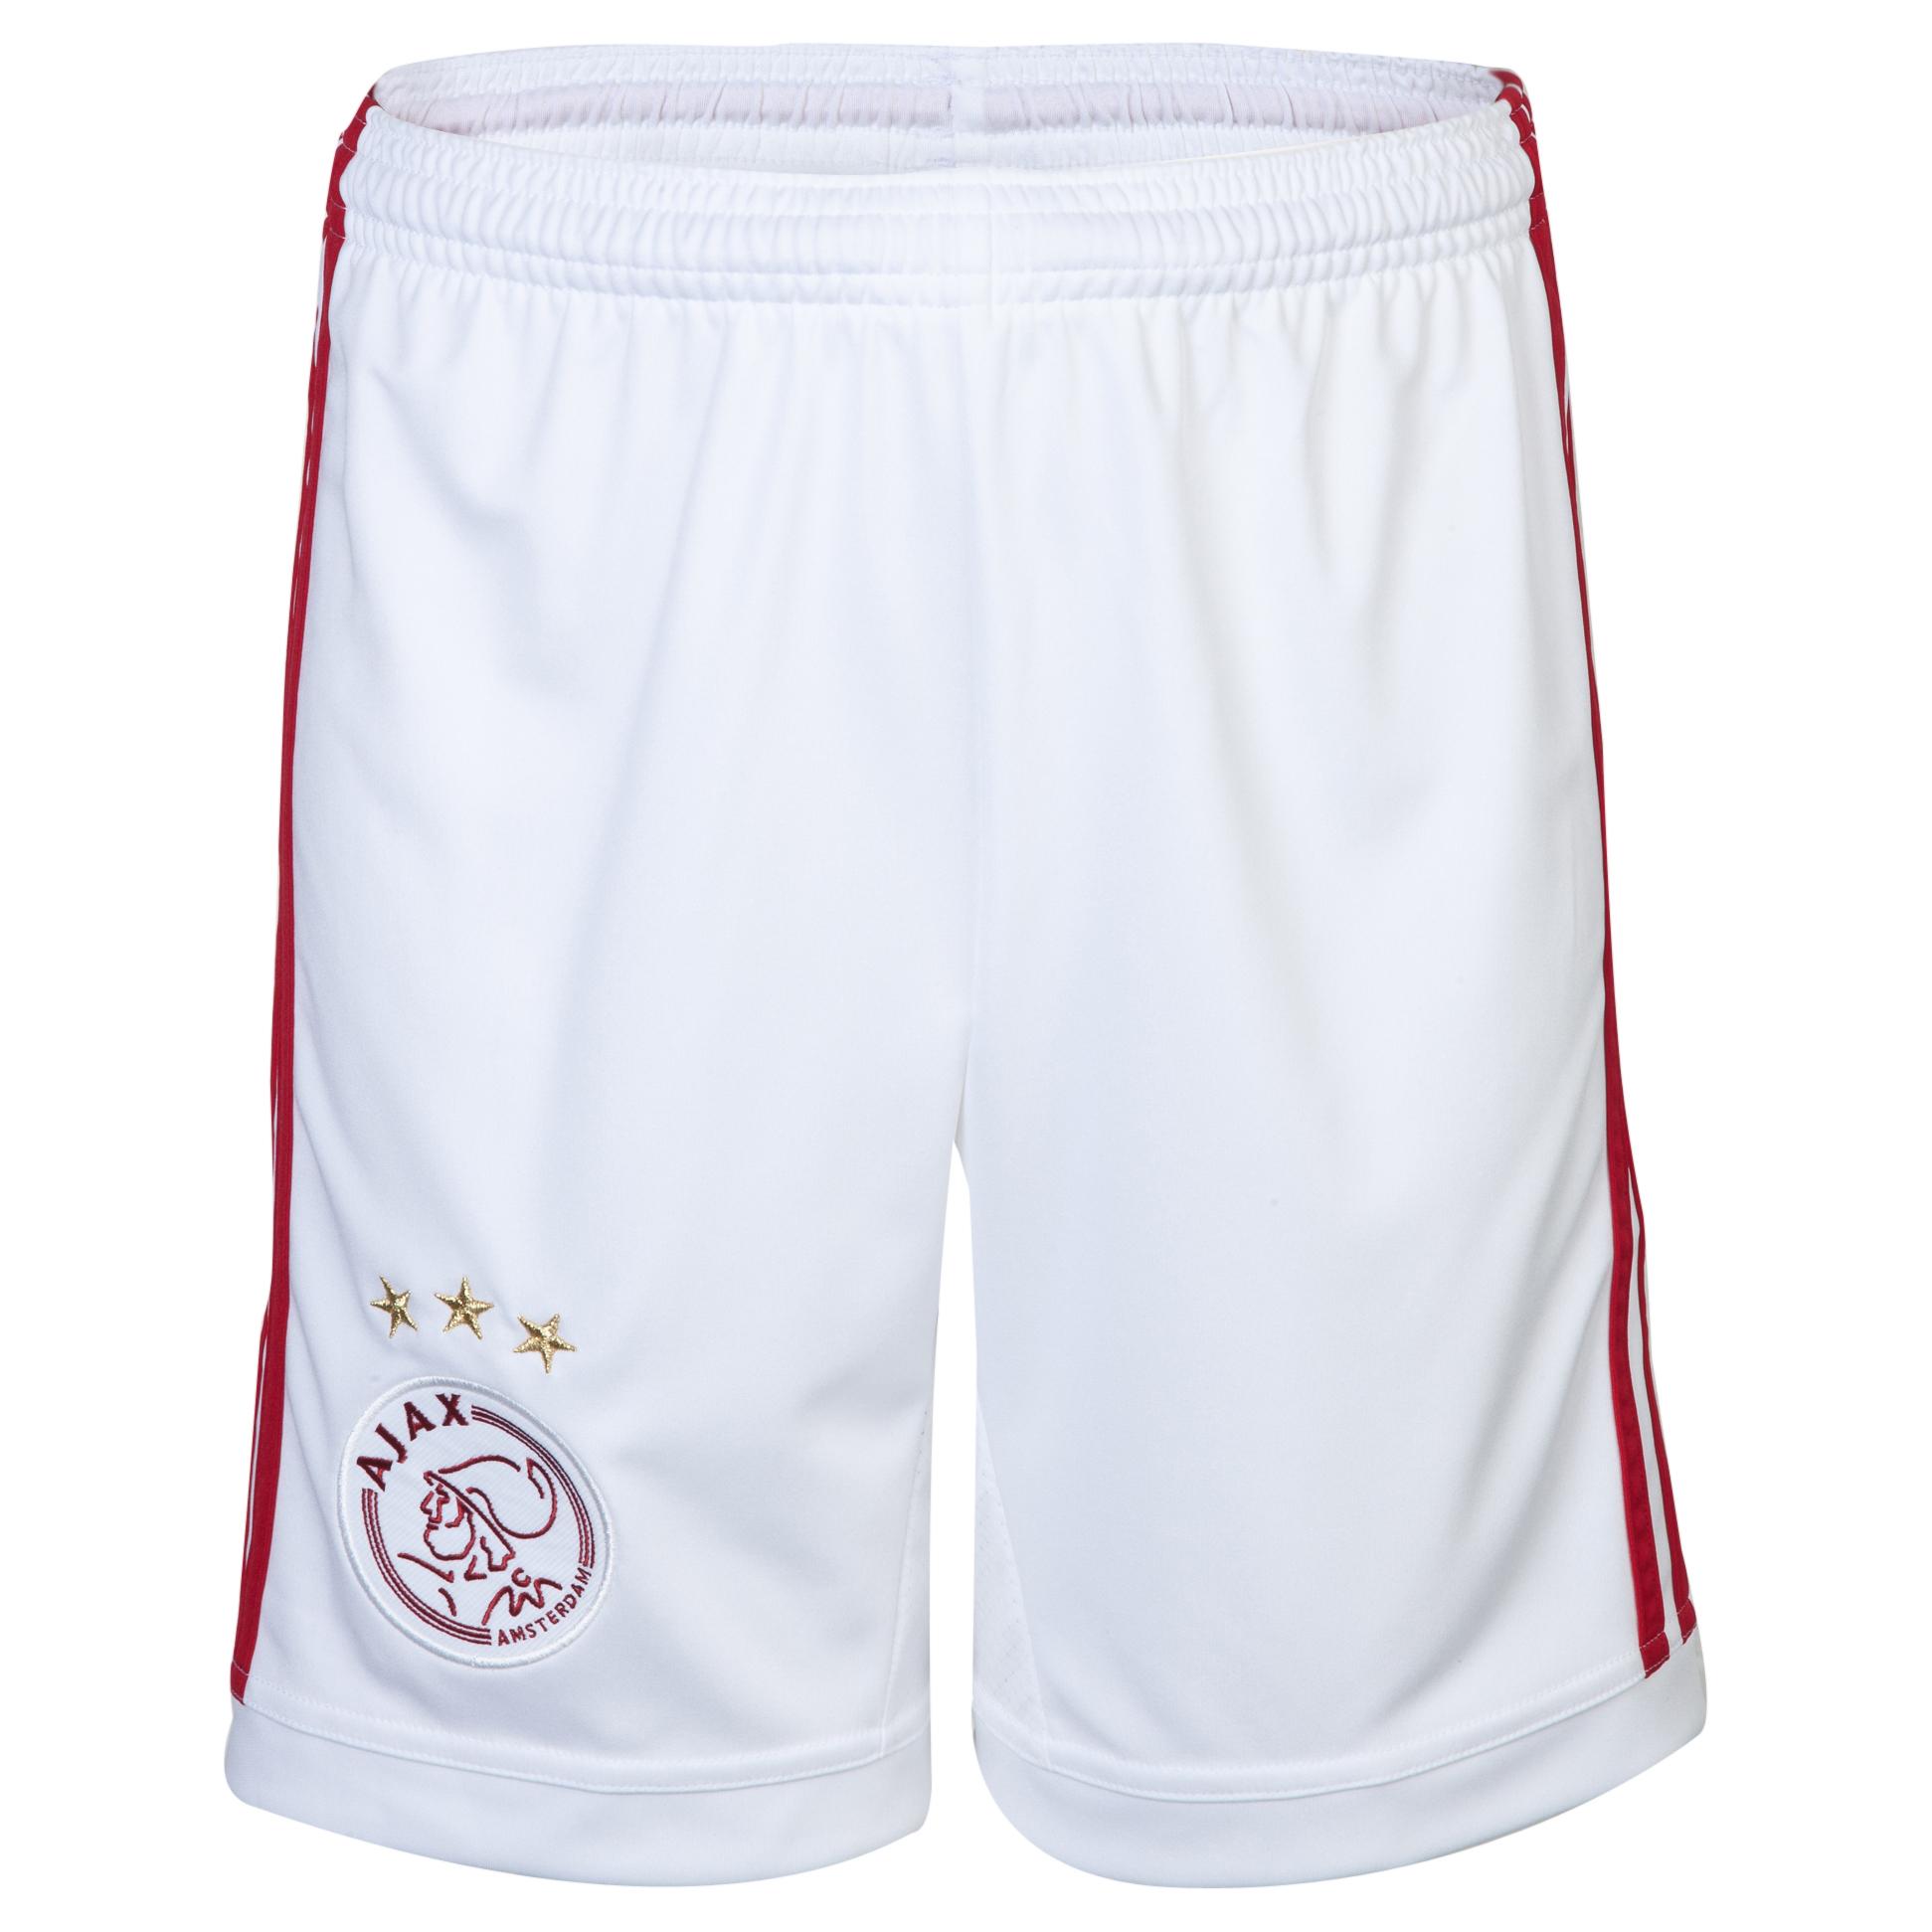 Ajax Home Shorts 2013/14 - kids